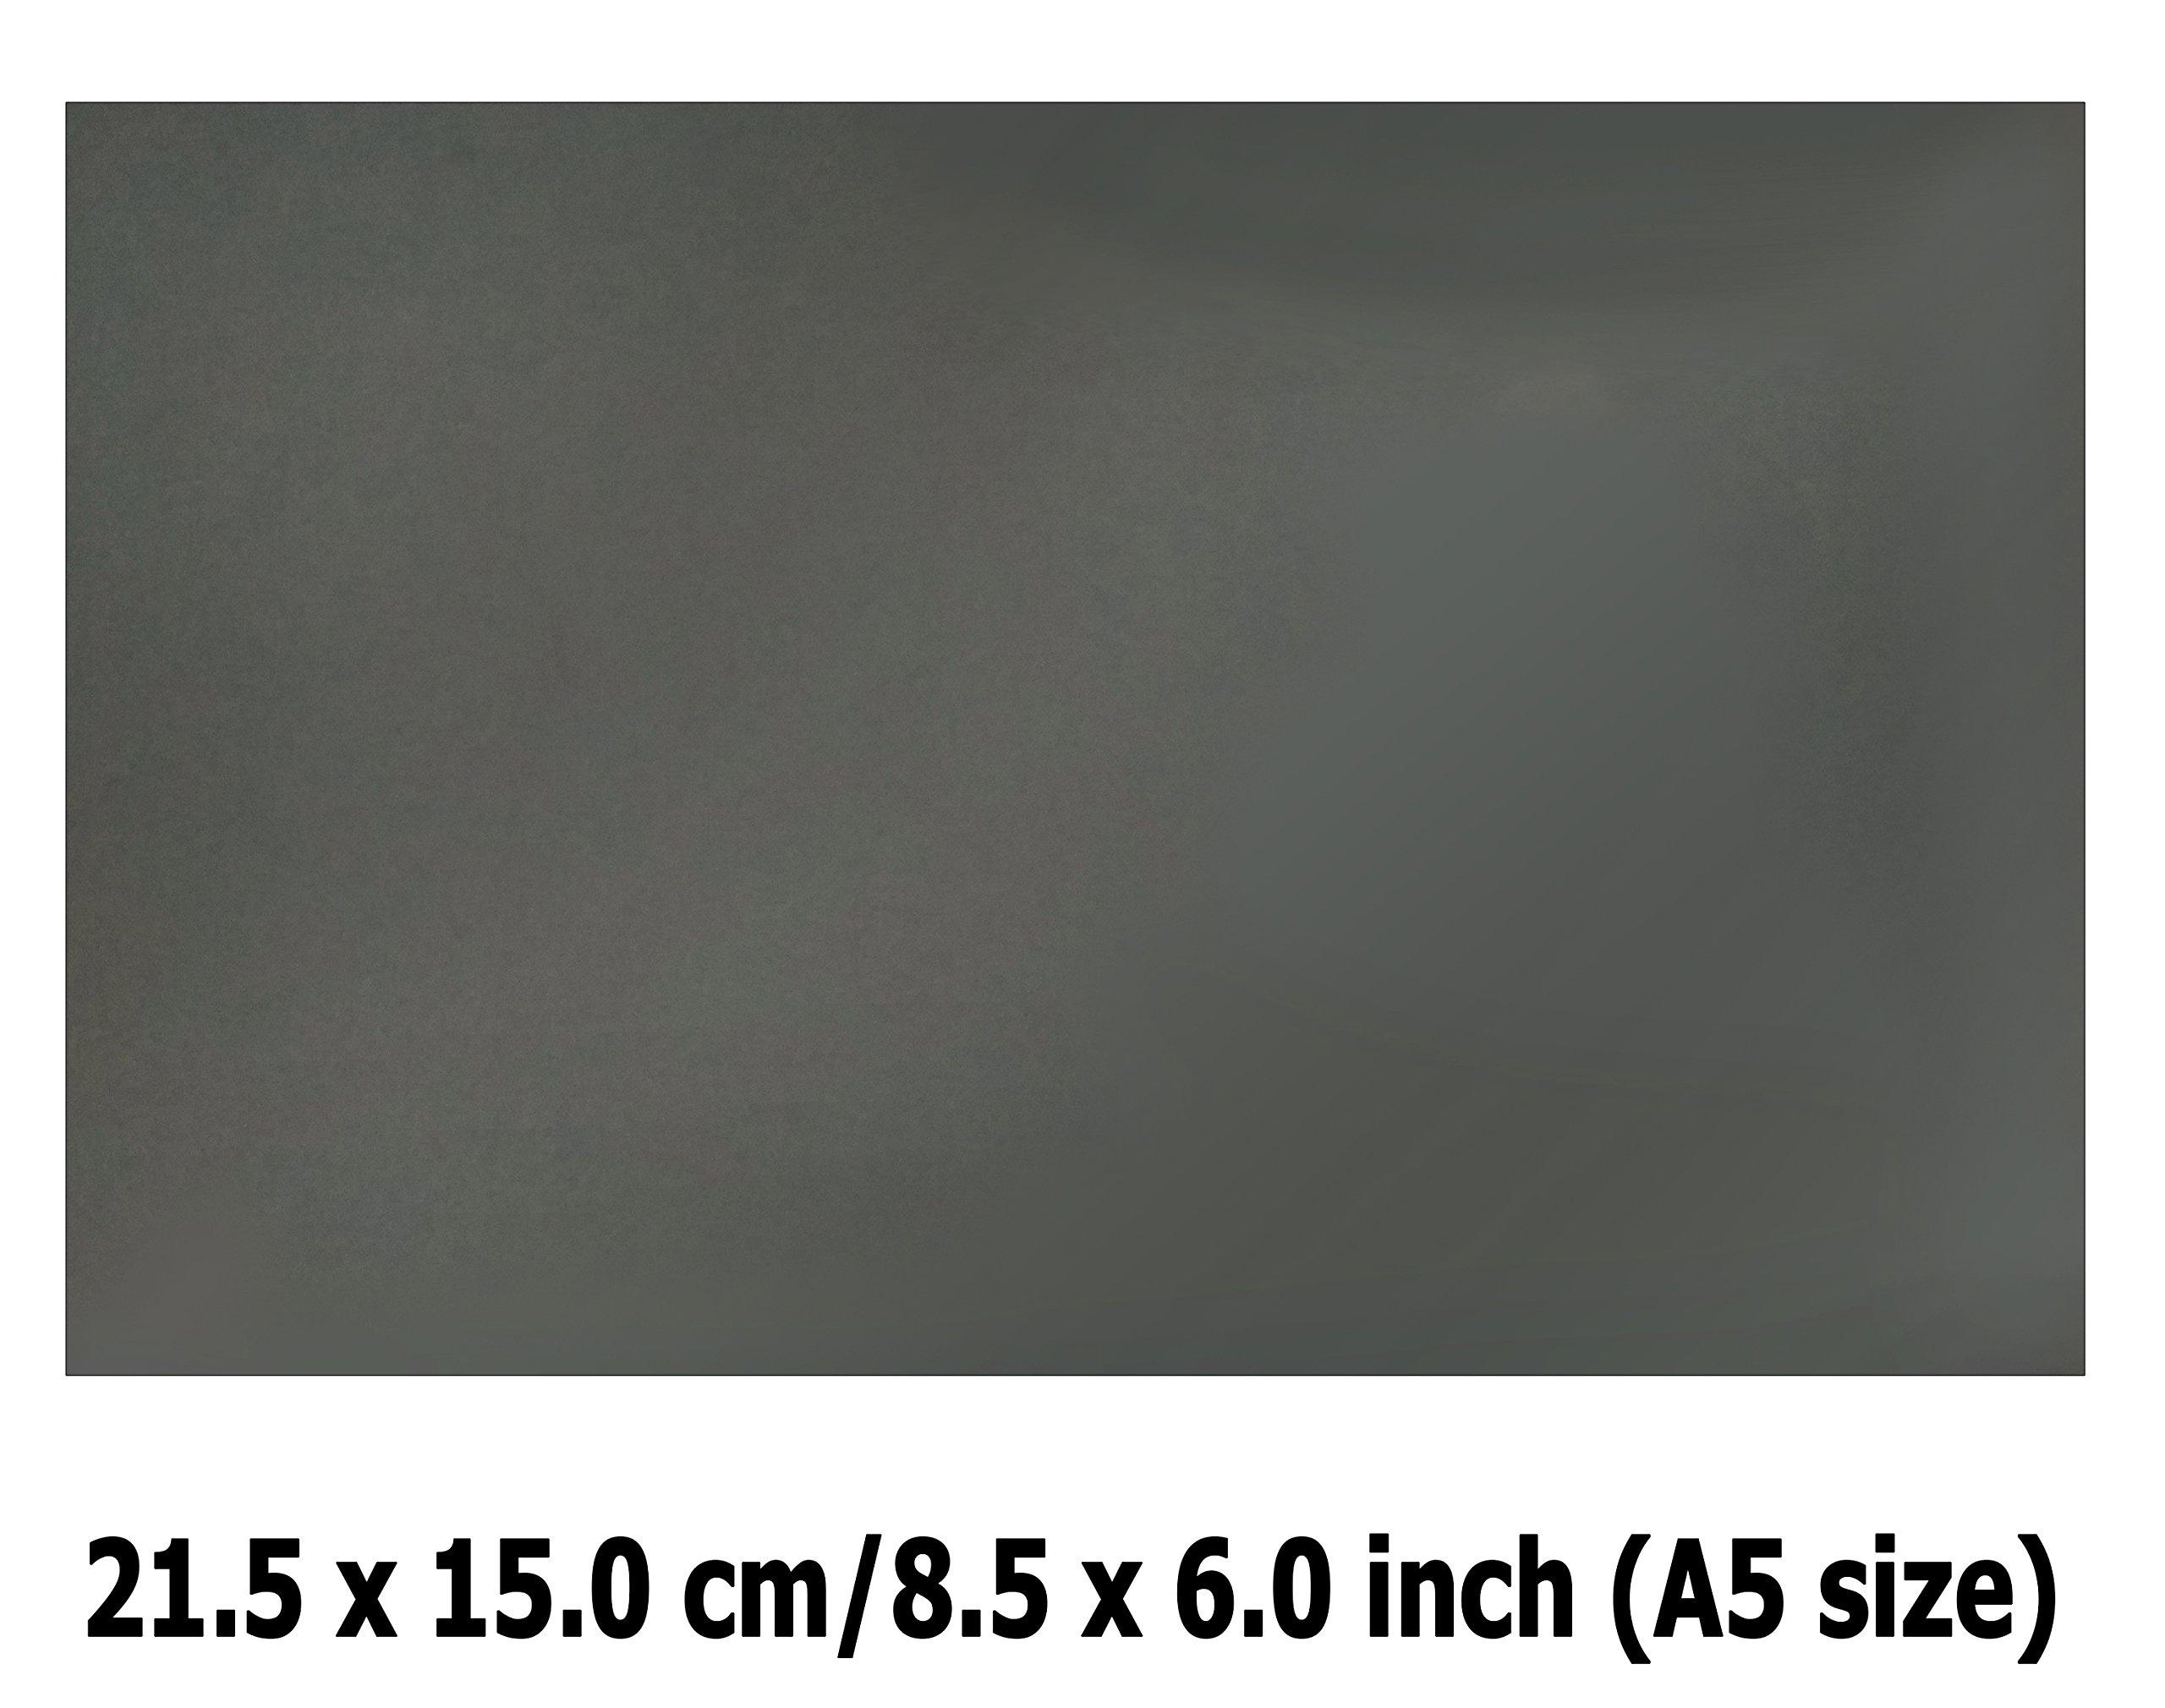 Linear Polarization A5 Sheet Polarizer Educational Physics Polarized Filter Optical by Izgut